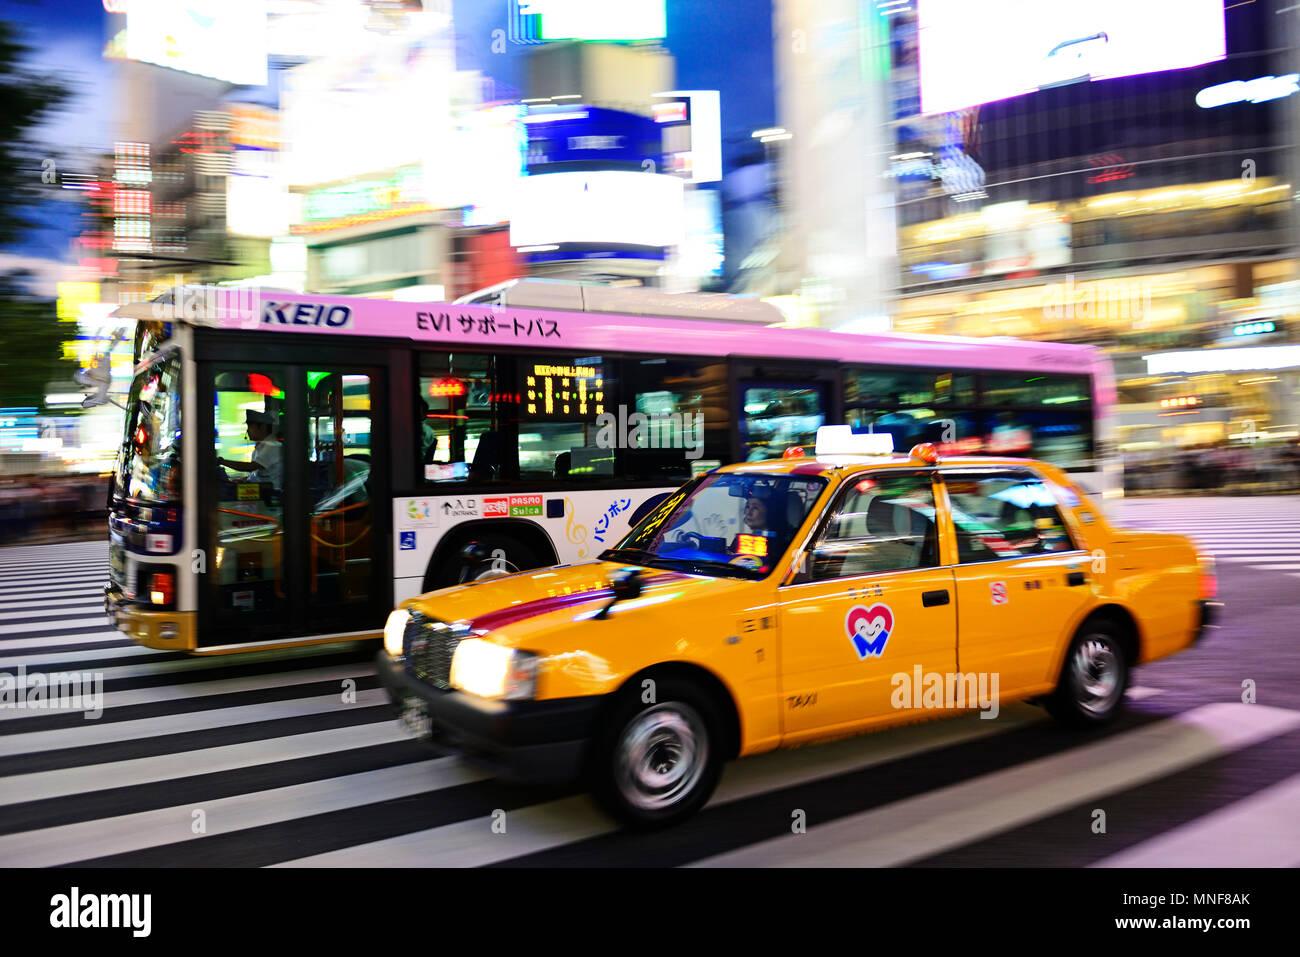 Infrastruktur, Verkehr, Taxi und Bus auf Meiji Dori-Street, Shibuja Crossing, Tokio, Japan Stockbild